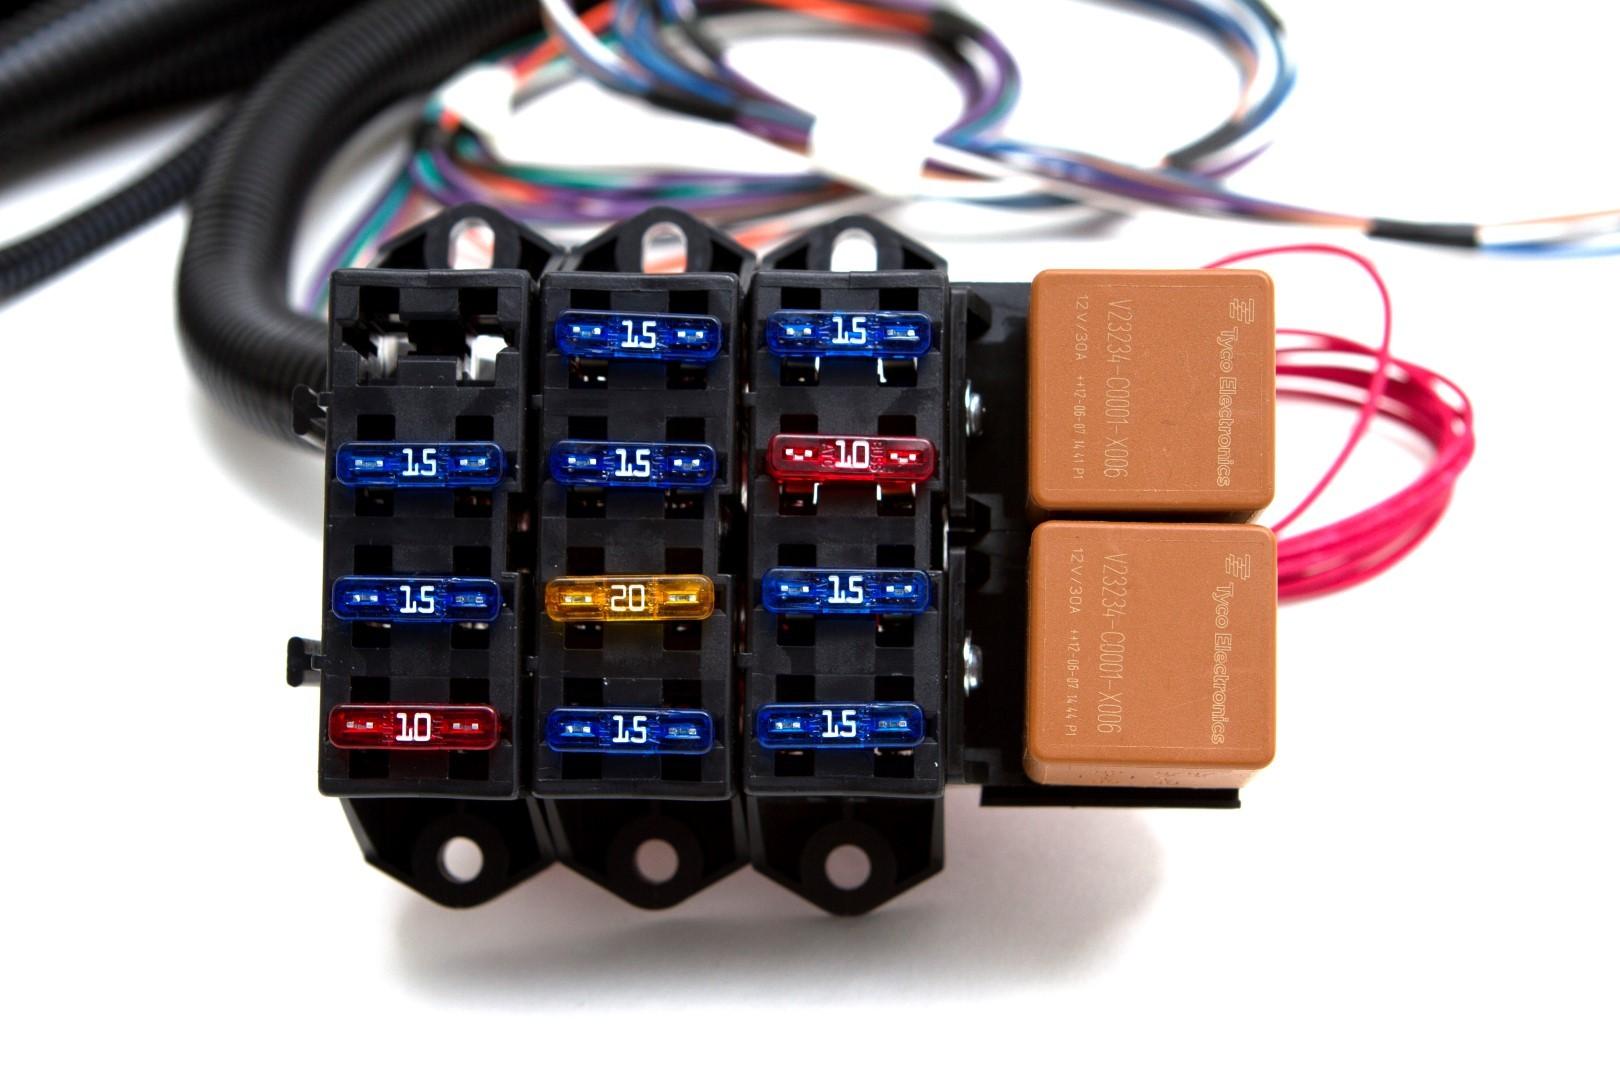 Ls3 Plug and Play Install Instructions 08 13 Ls3 6 2l Standalone Wiring Harness W 4l60e Custom Image Corvettes Of Ls3 Plug and Play Install Instructions